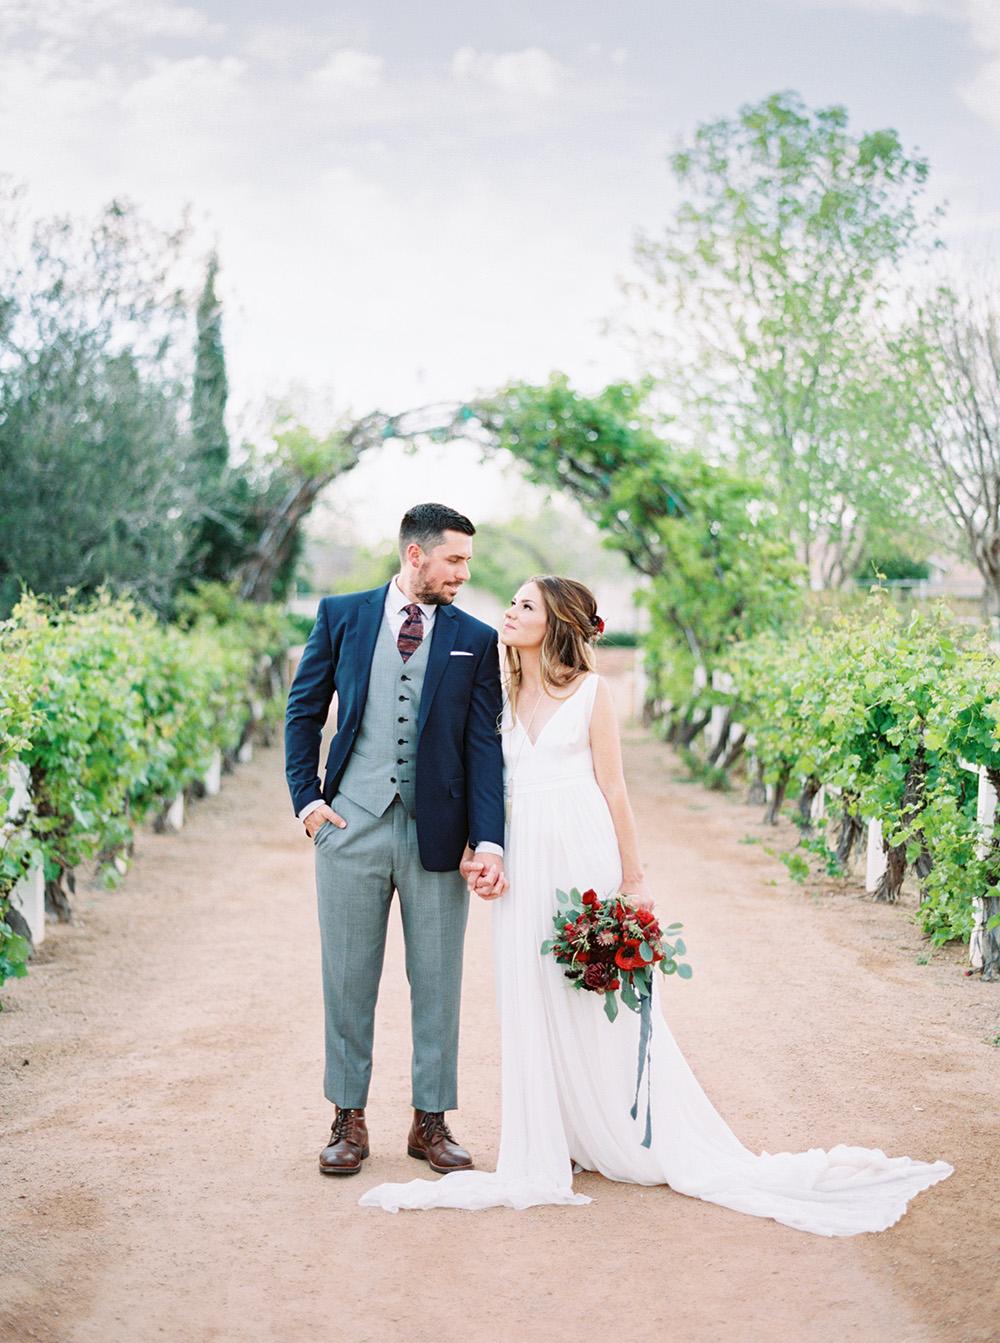 wedding inspiration - photo by Melissa Jill http://ruffledblog.com/fruit-filled-vineyard-wedding-inspiration